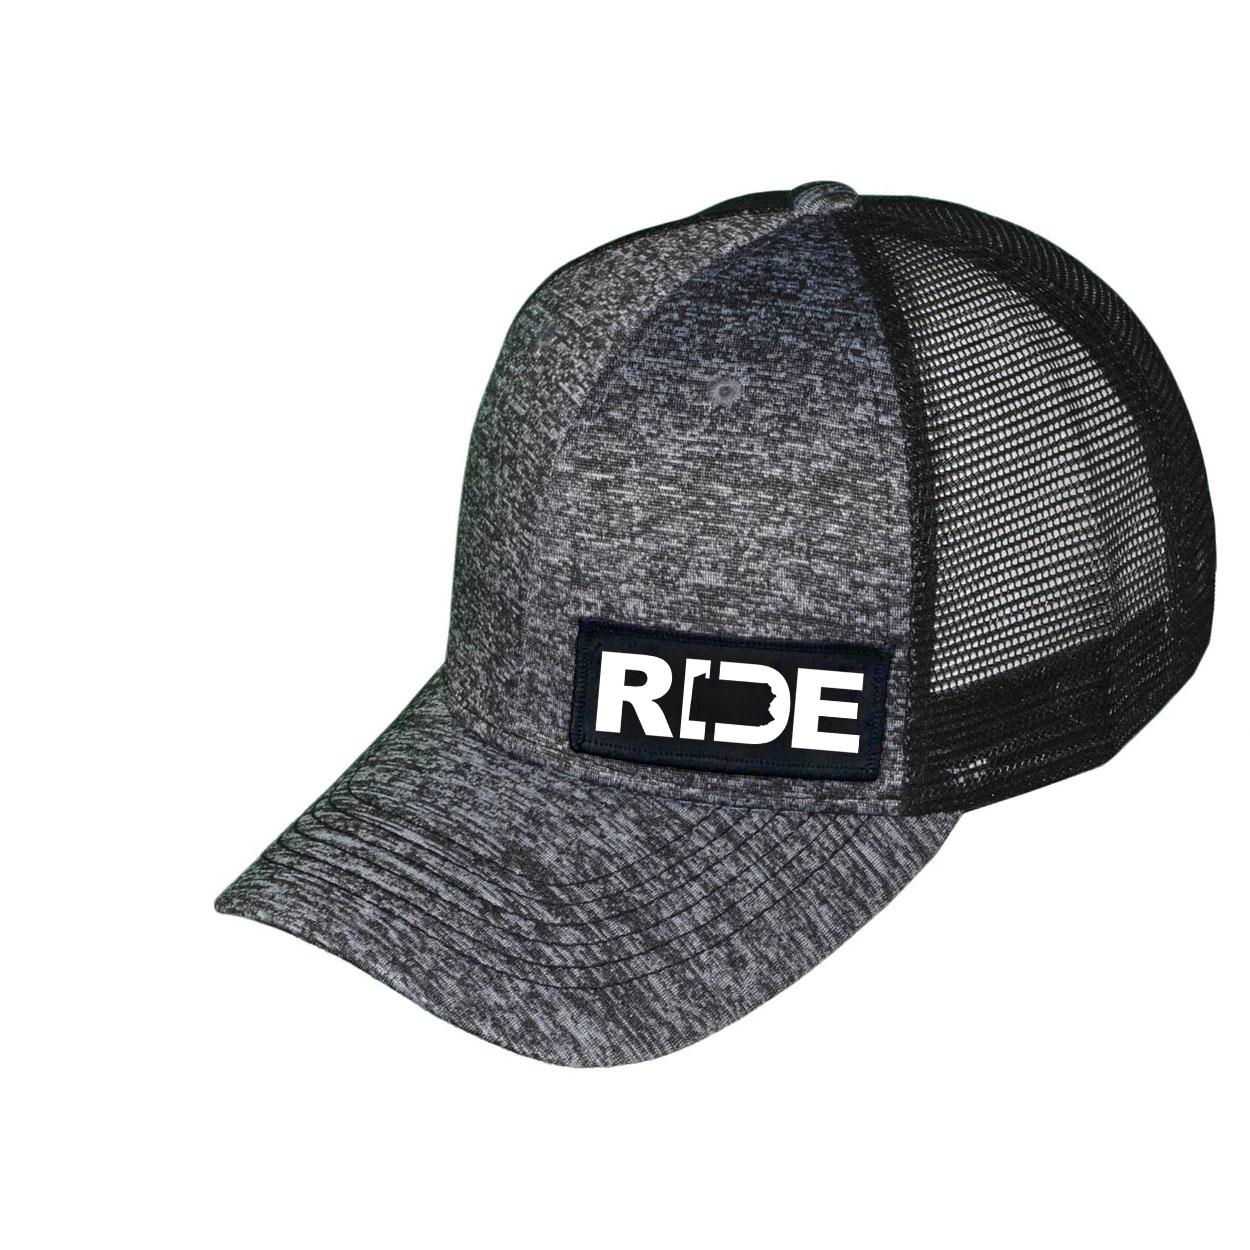 Ride Pennsylvania Night Out Woven Patch Melange Snapback Trucker Hat Gray/Black (White Logo)